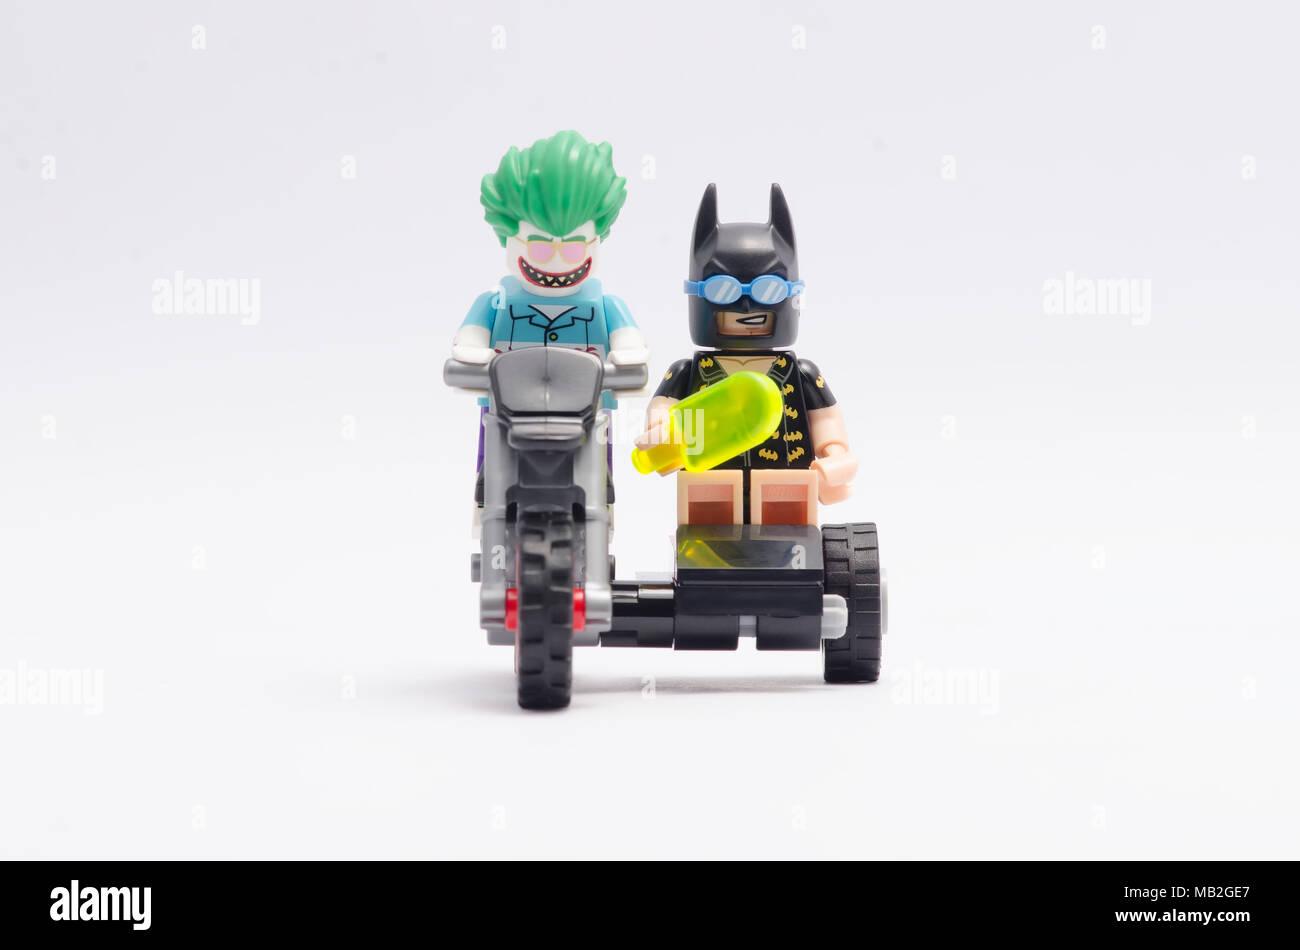 Lego Joker And Batman Riding Motorcycle Isolated On White Background